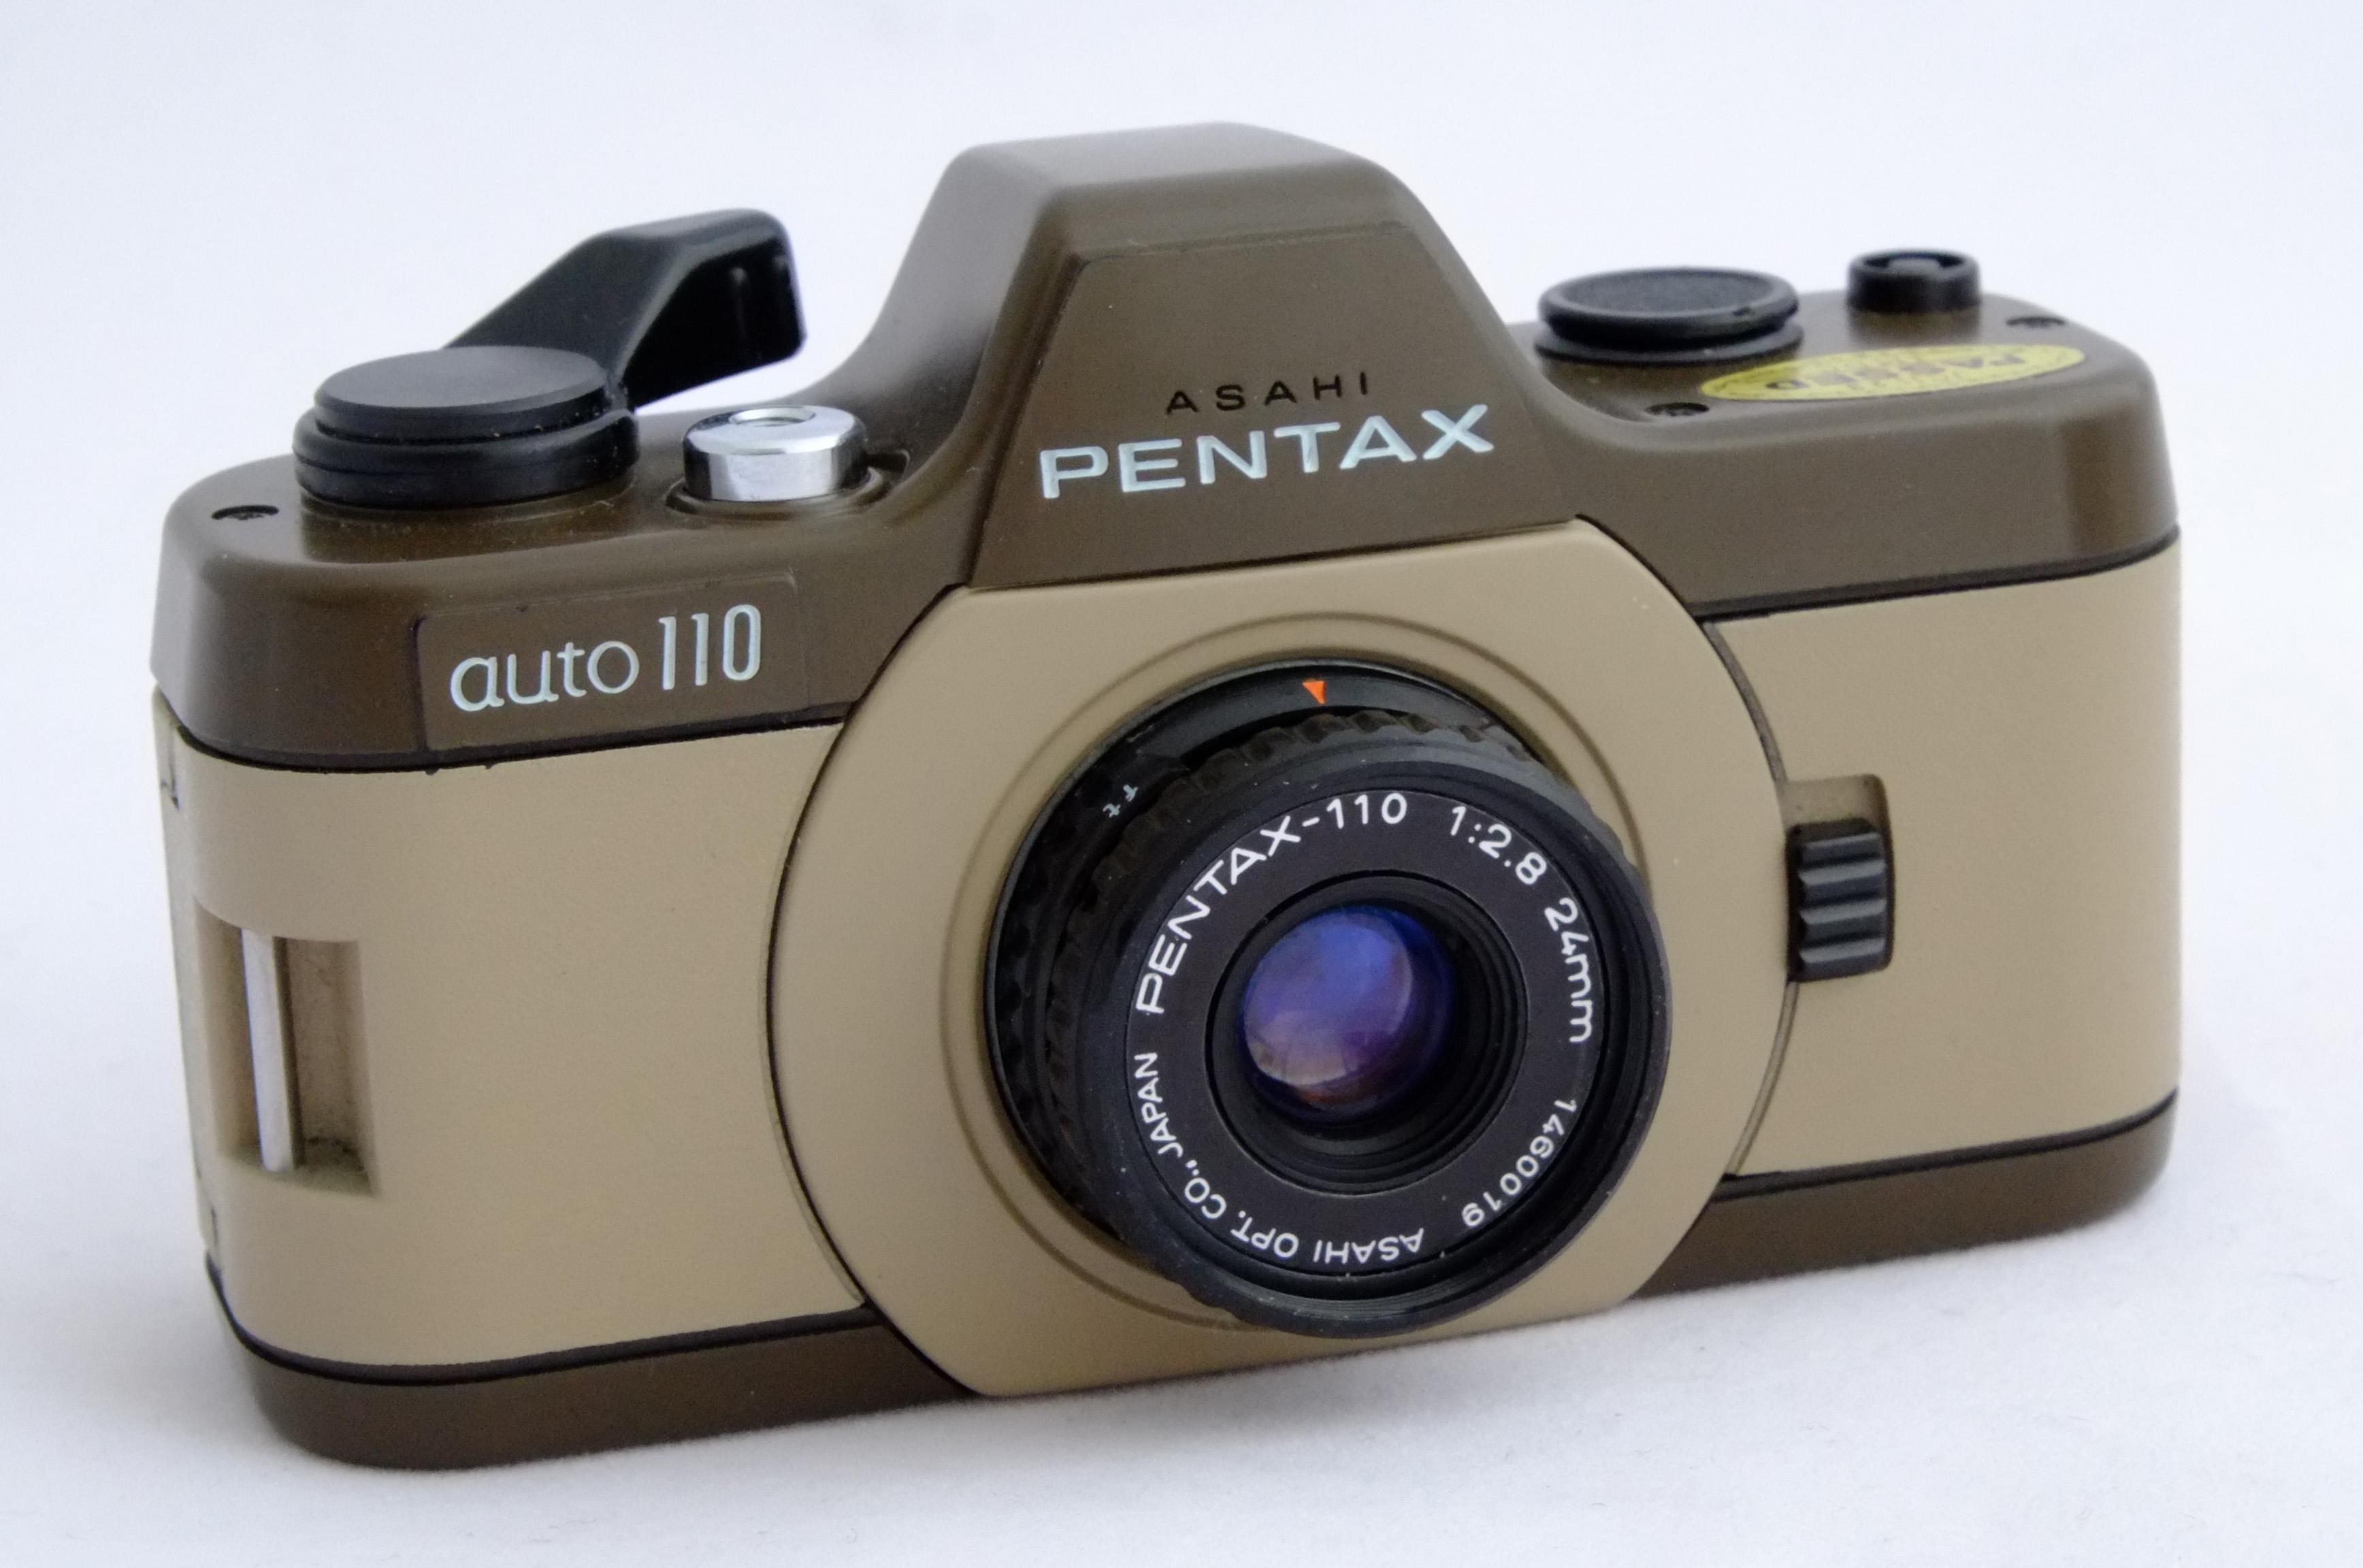 Pentax Auto 110 Safari